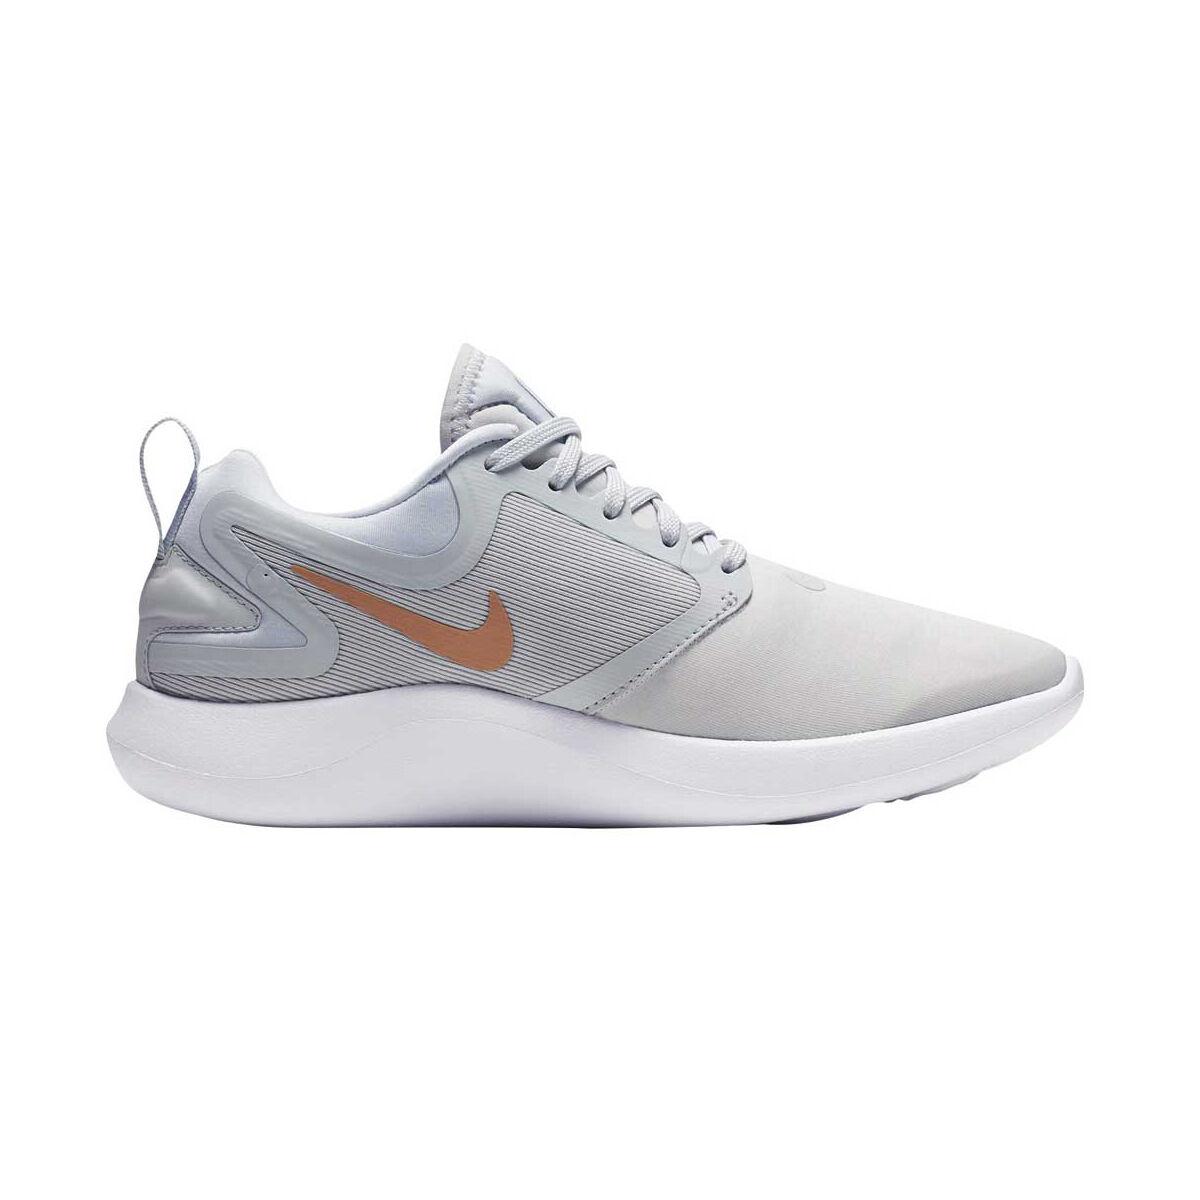 best cheap a01d6 b0a43 ... discount nike lunarepic low flyknit 2 womens running shoes black white  us 7 black b8fa9 860cf